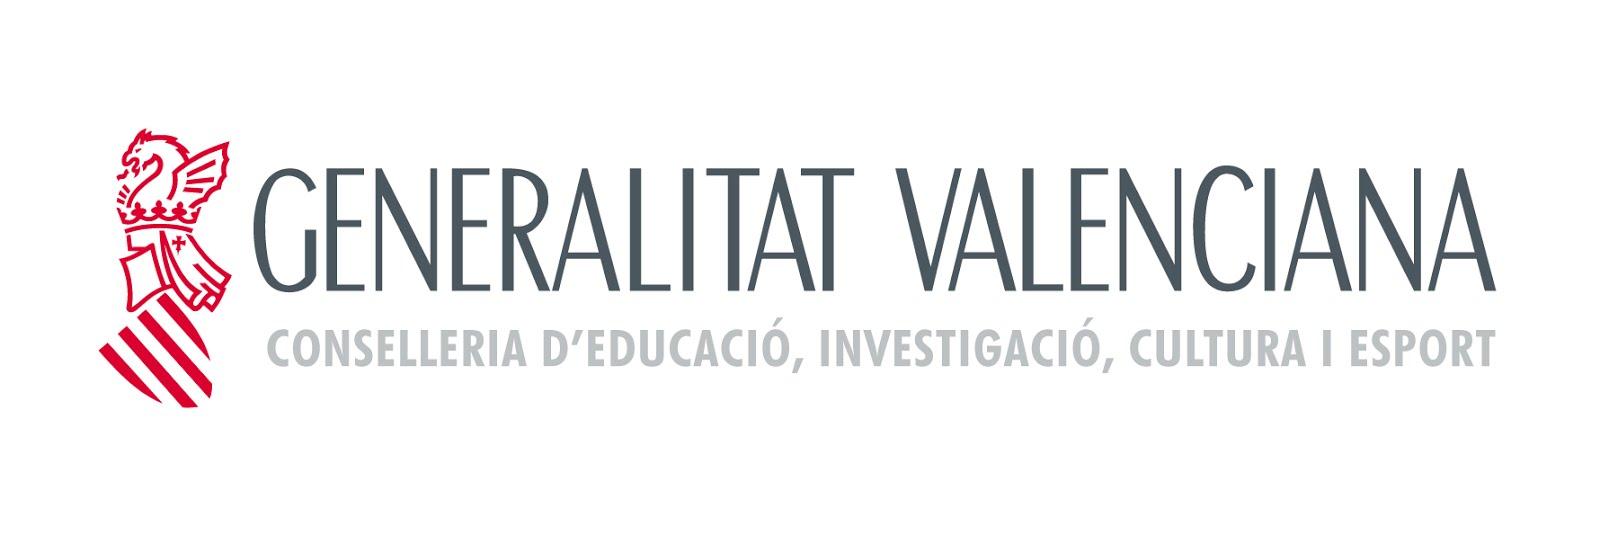 CONSELLERIA EDUCACIÓ